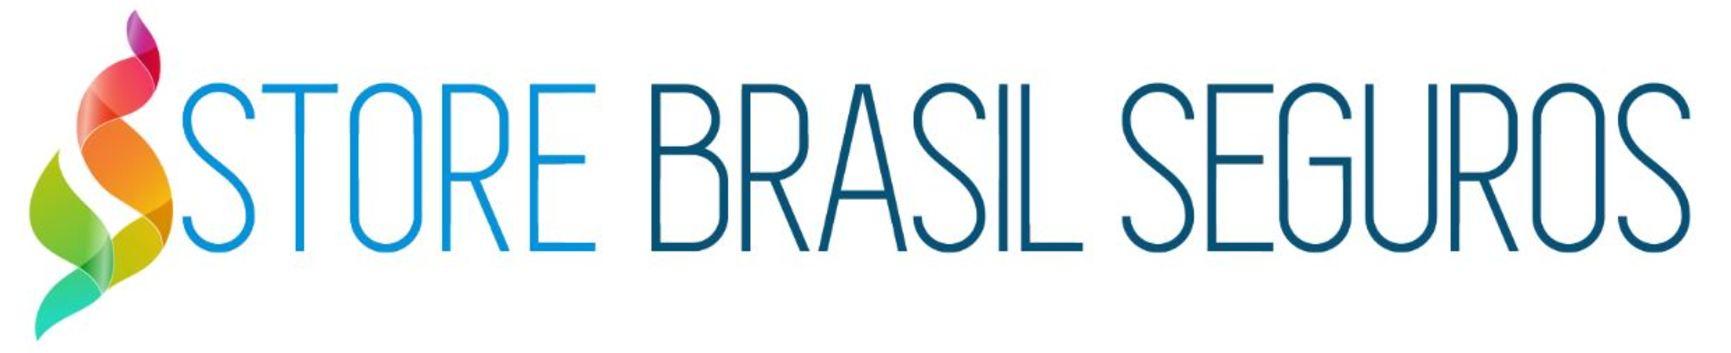 1d66a7b10 Logo do site